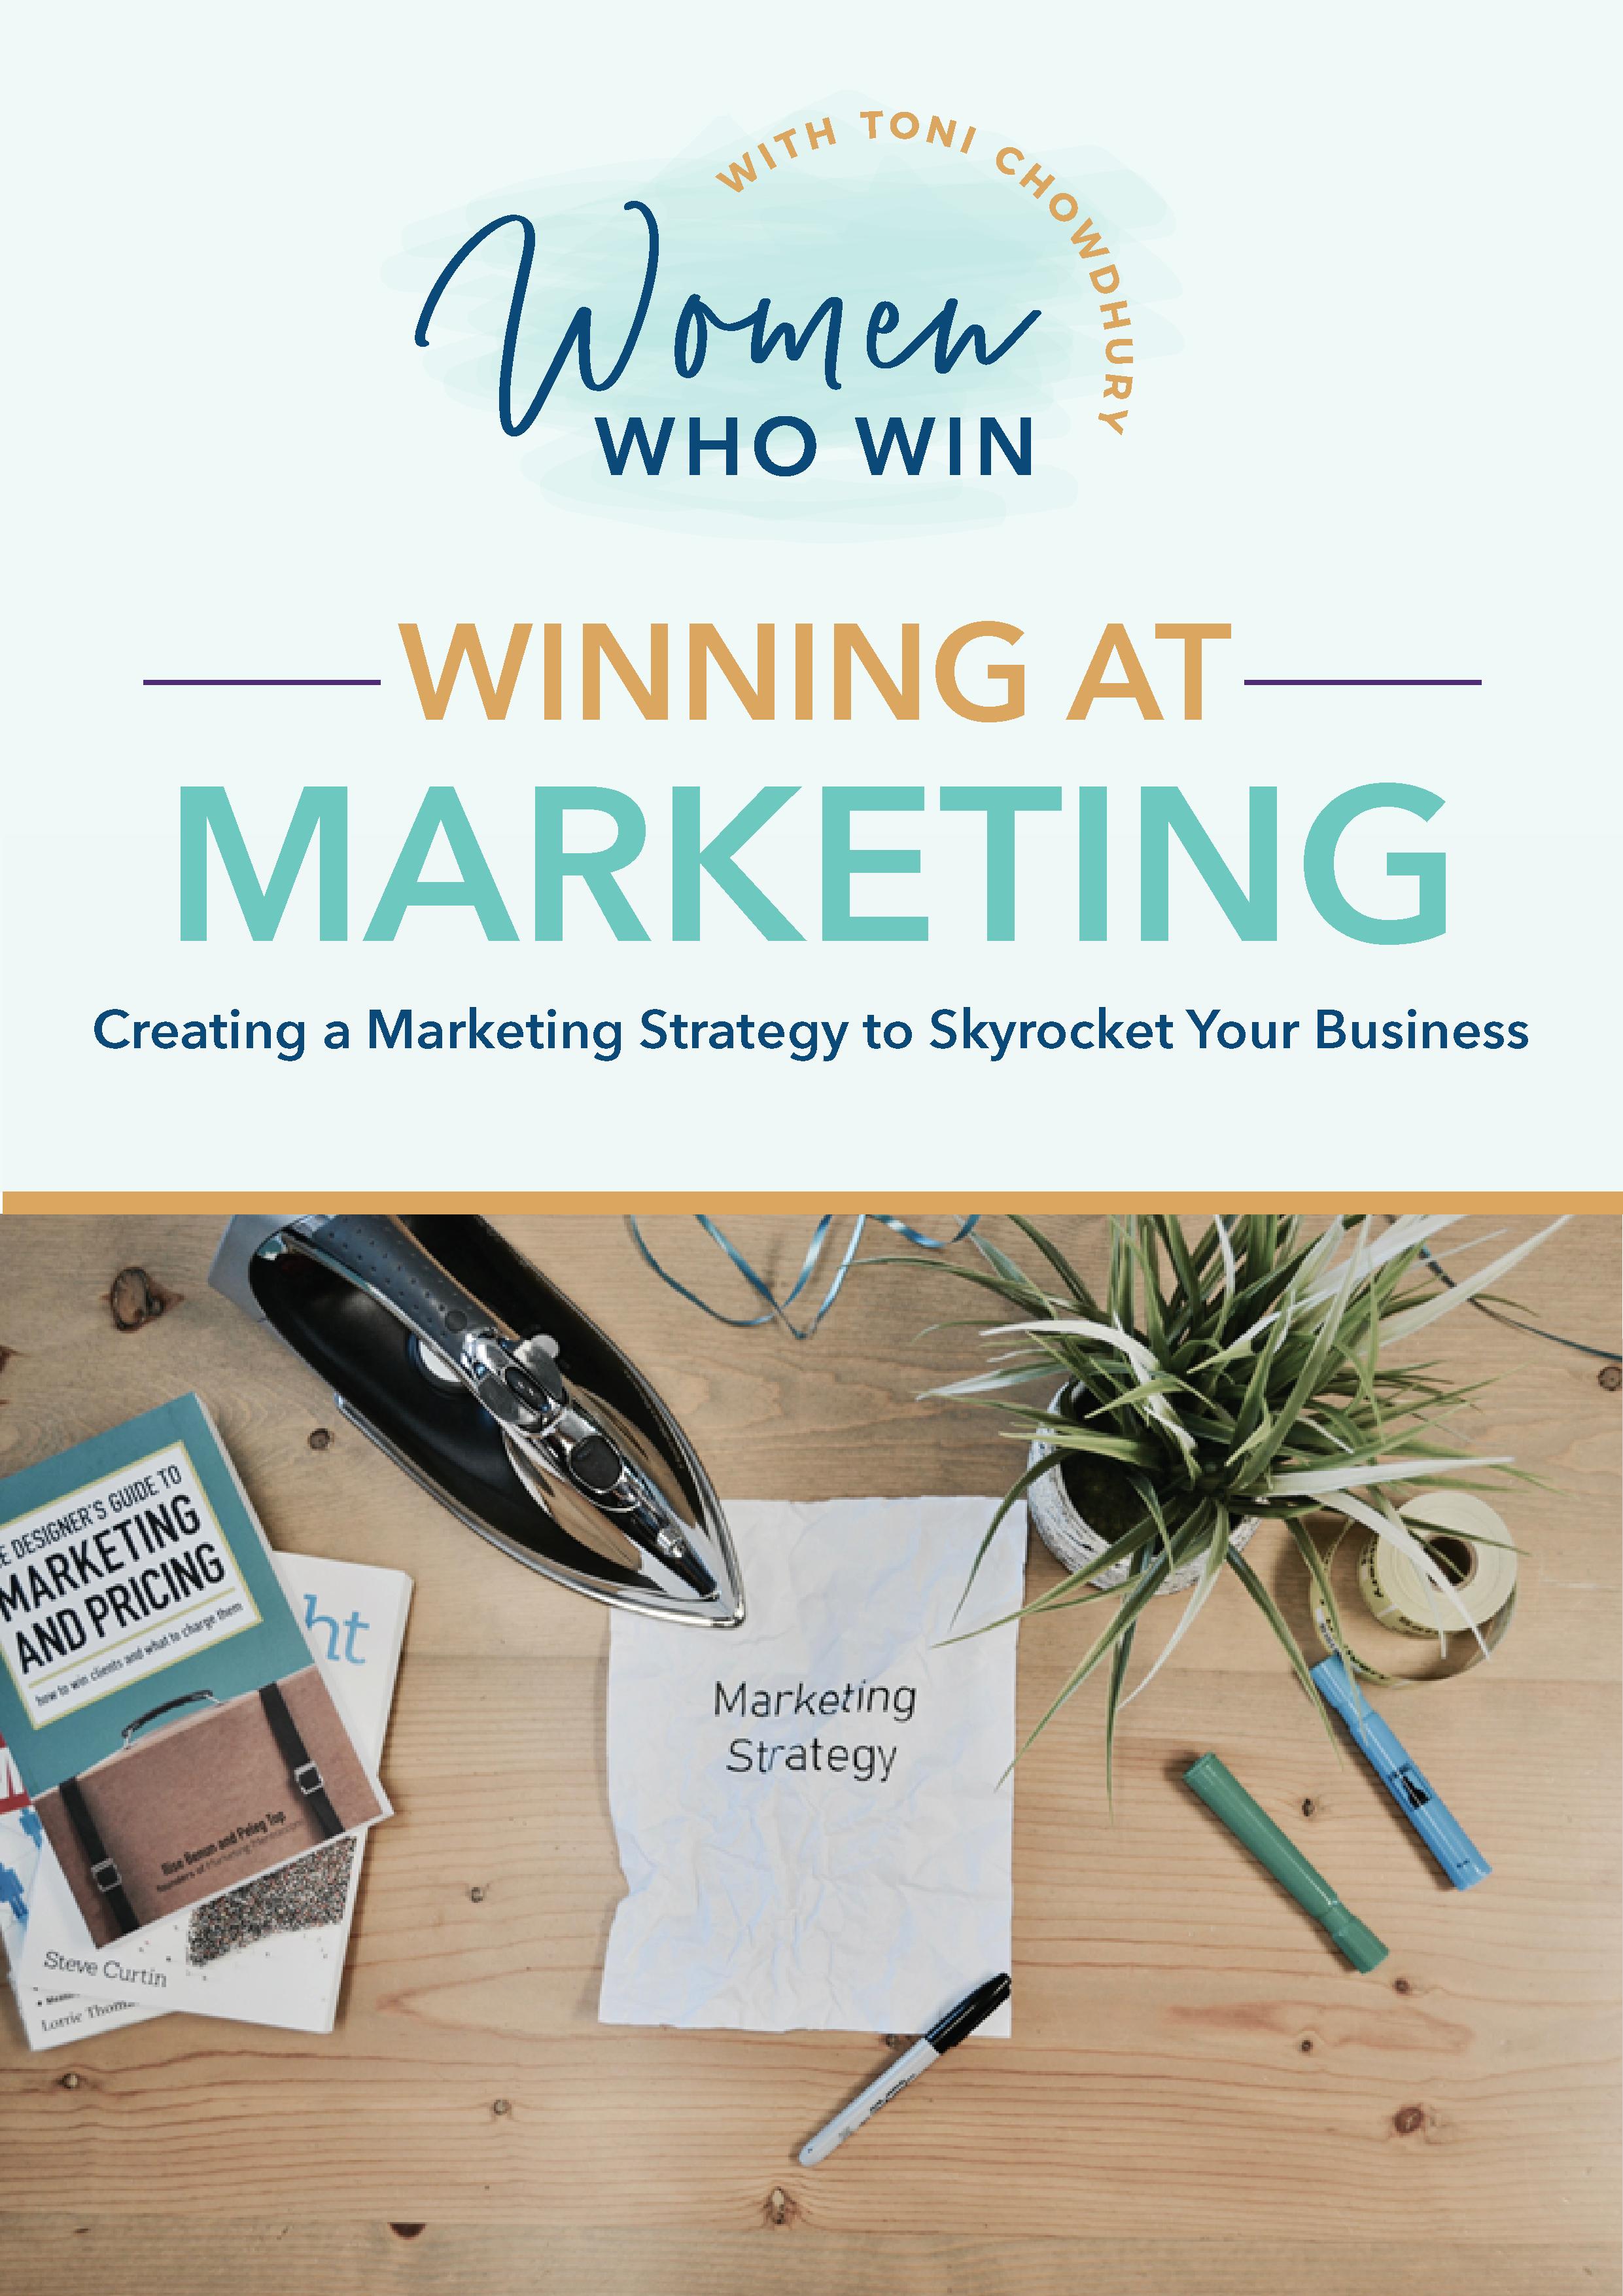 Women-Who-Win-Winning-At-Marketing.png